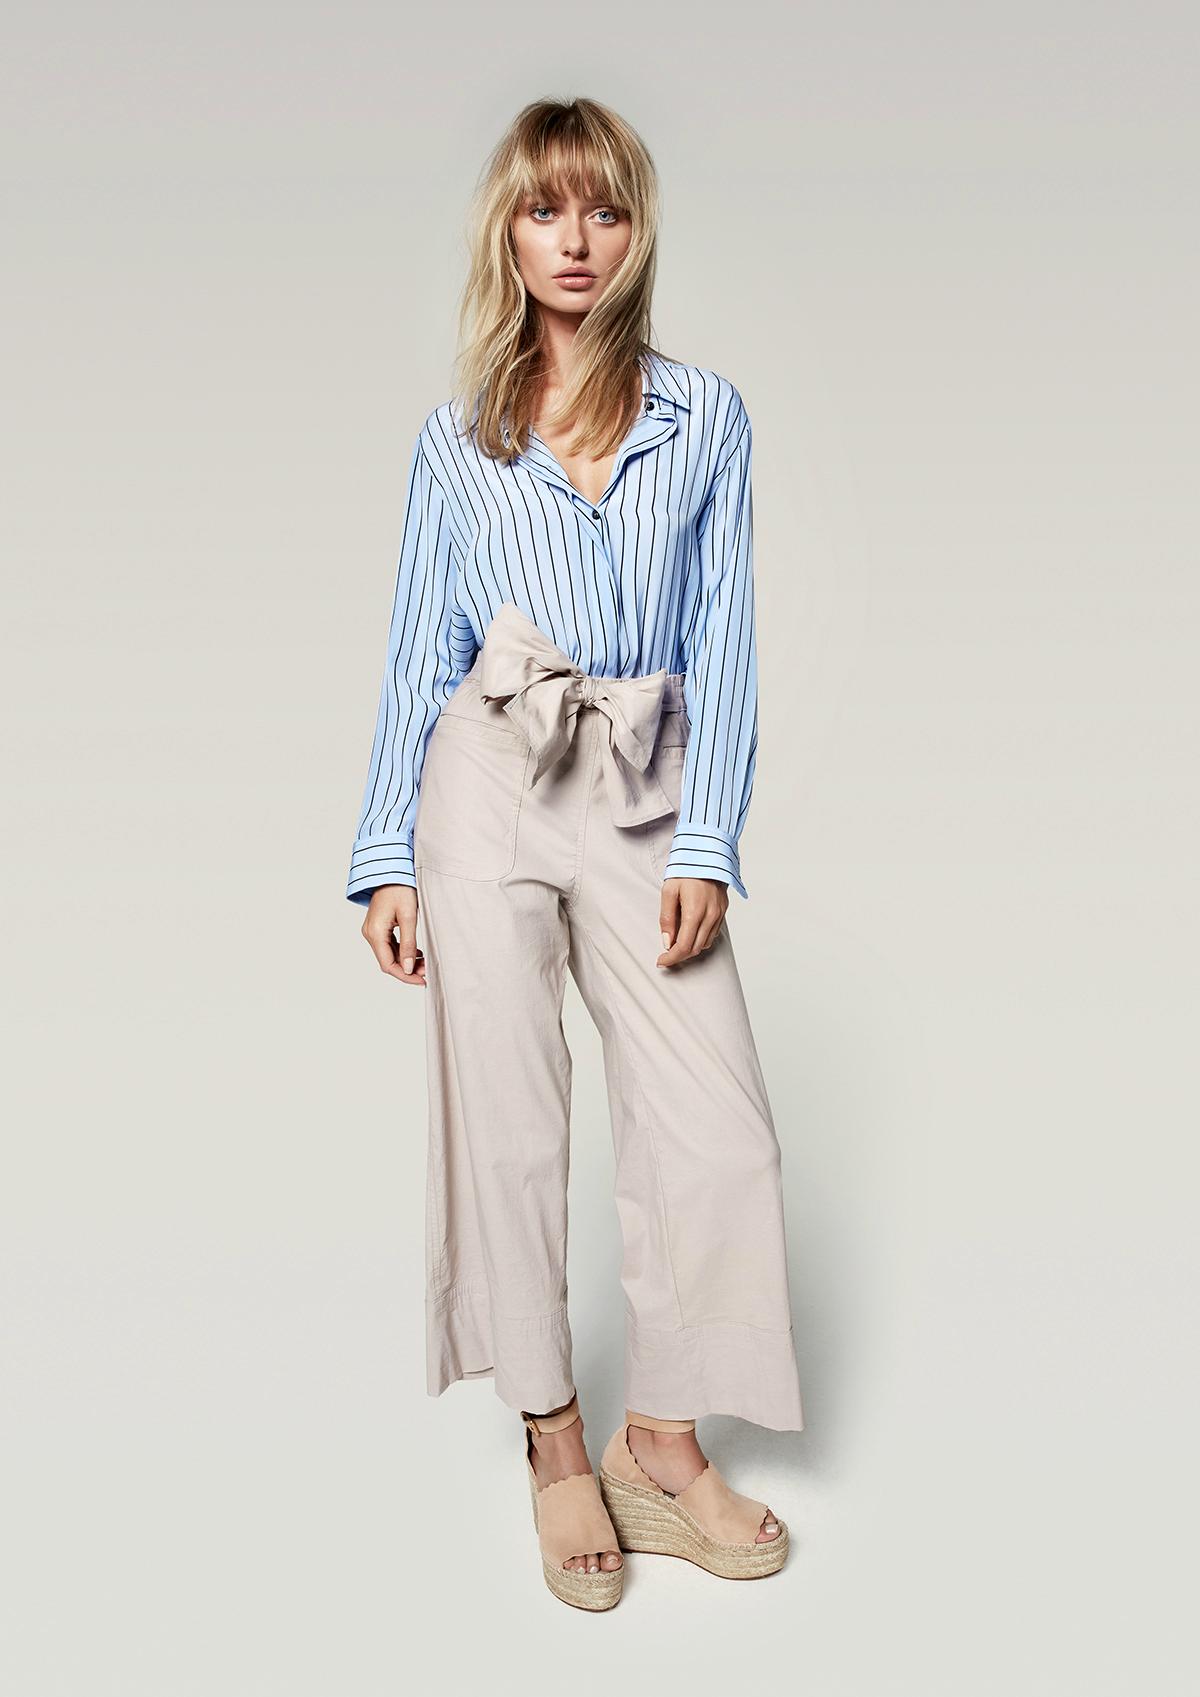 Mela Purdie tie pant | Mela Purdie soft shirt in poet's stripe | Zambezee Boutique